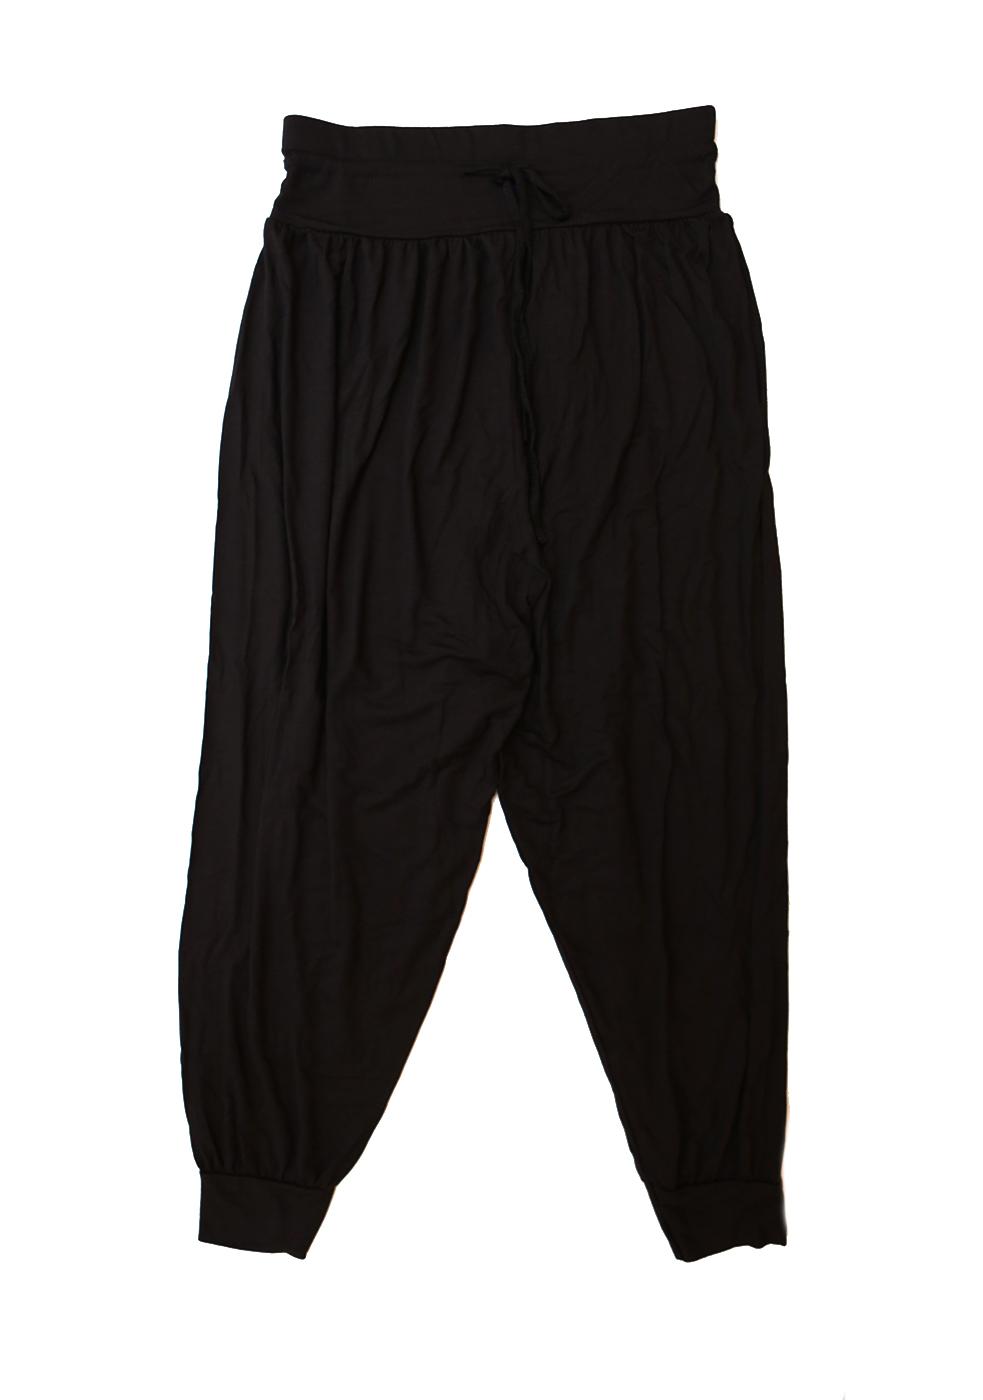 black harem pants itepowd